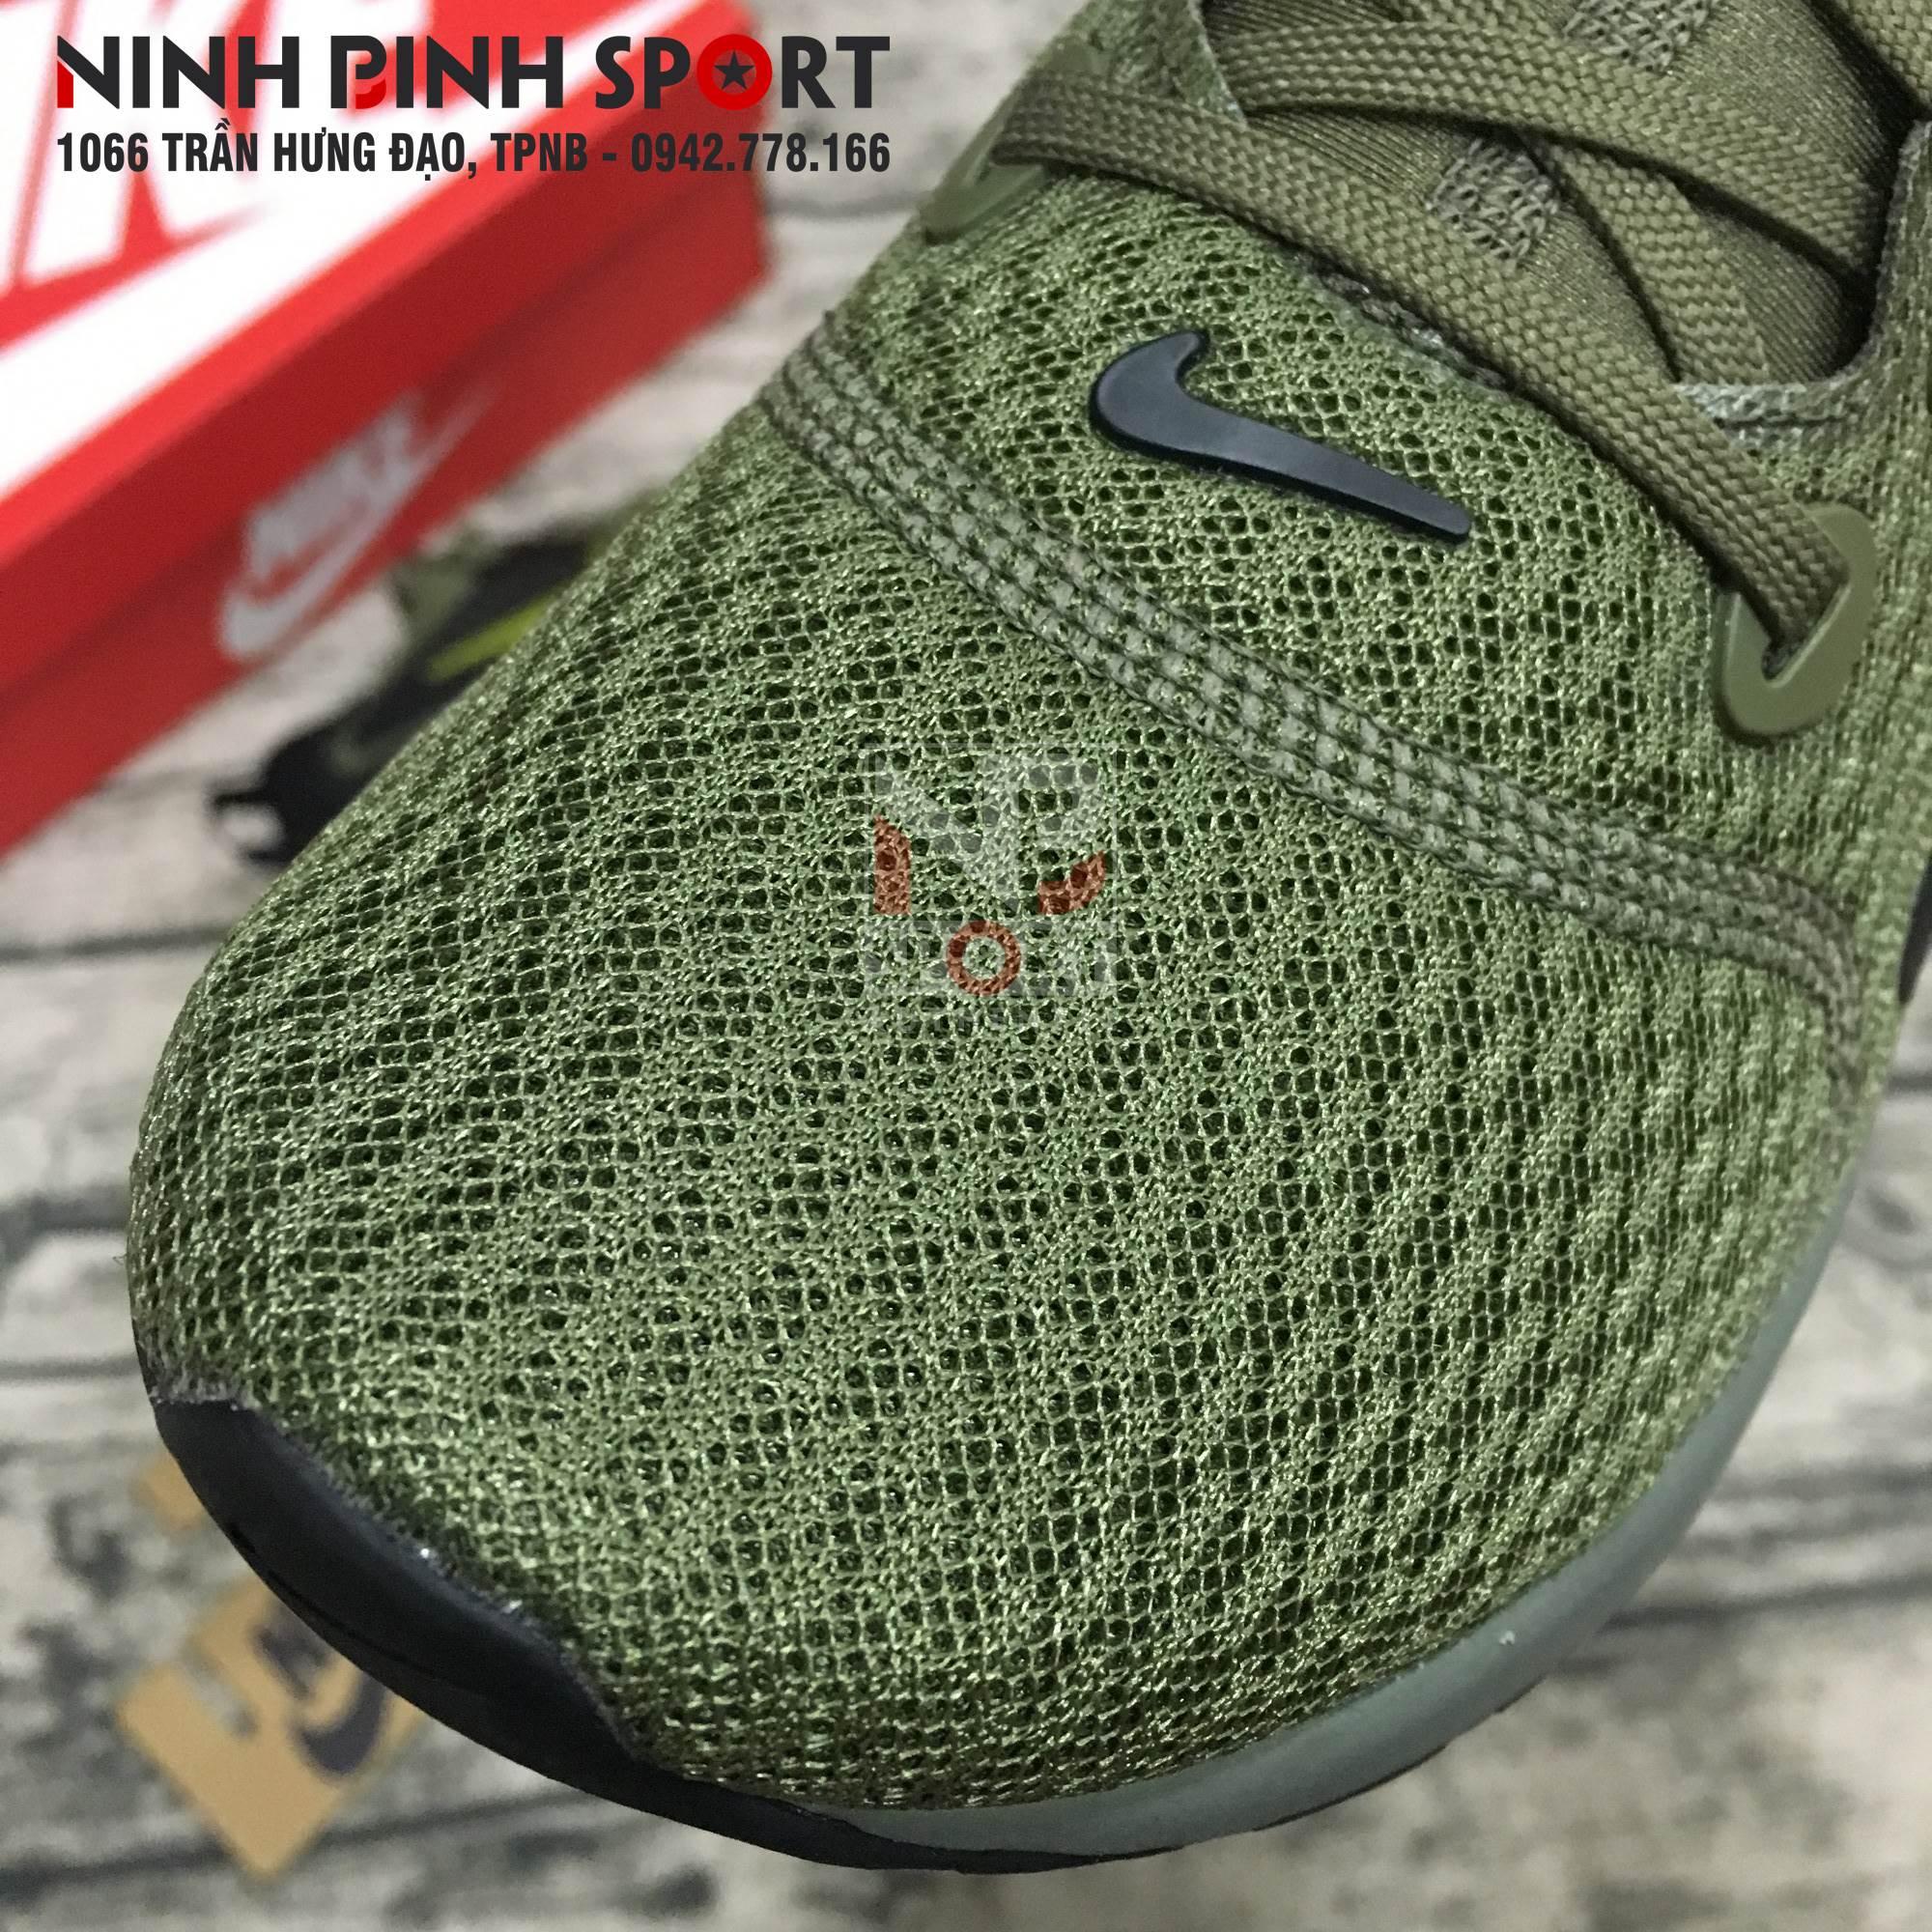 Giầy thể thao nam Nike Legend React AA1625-200